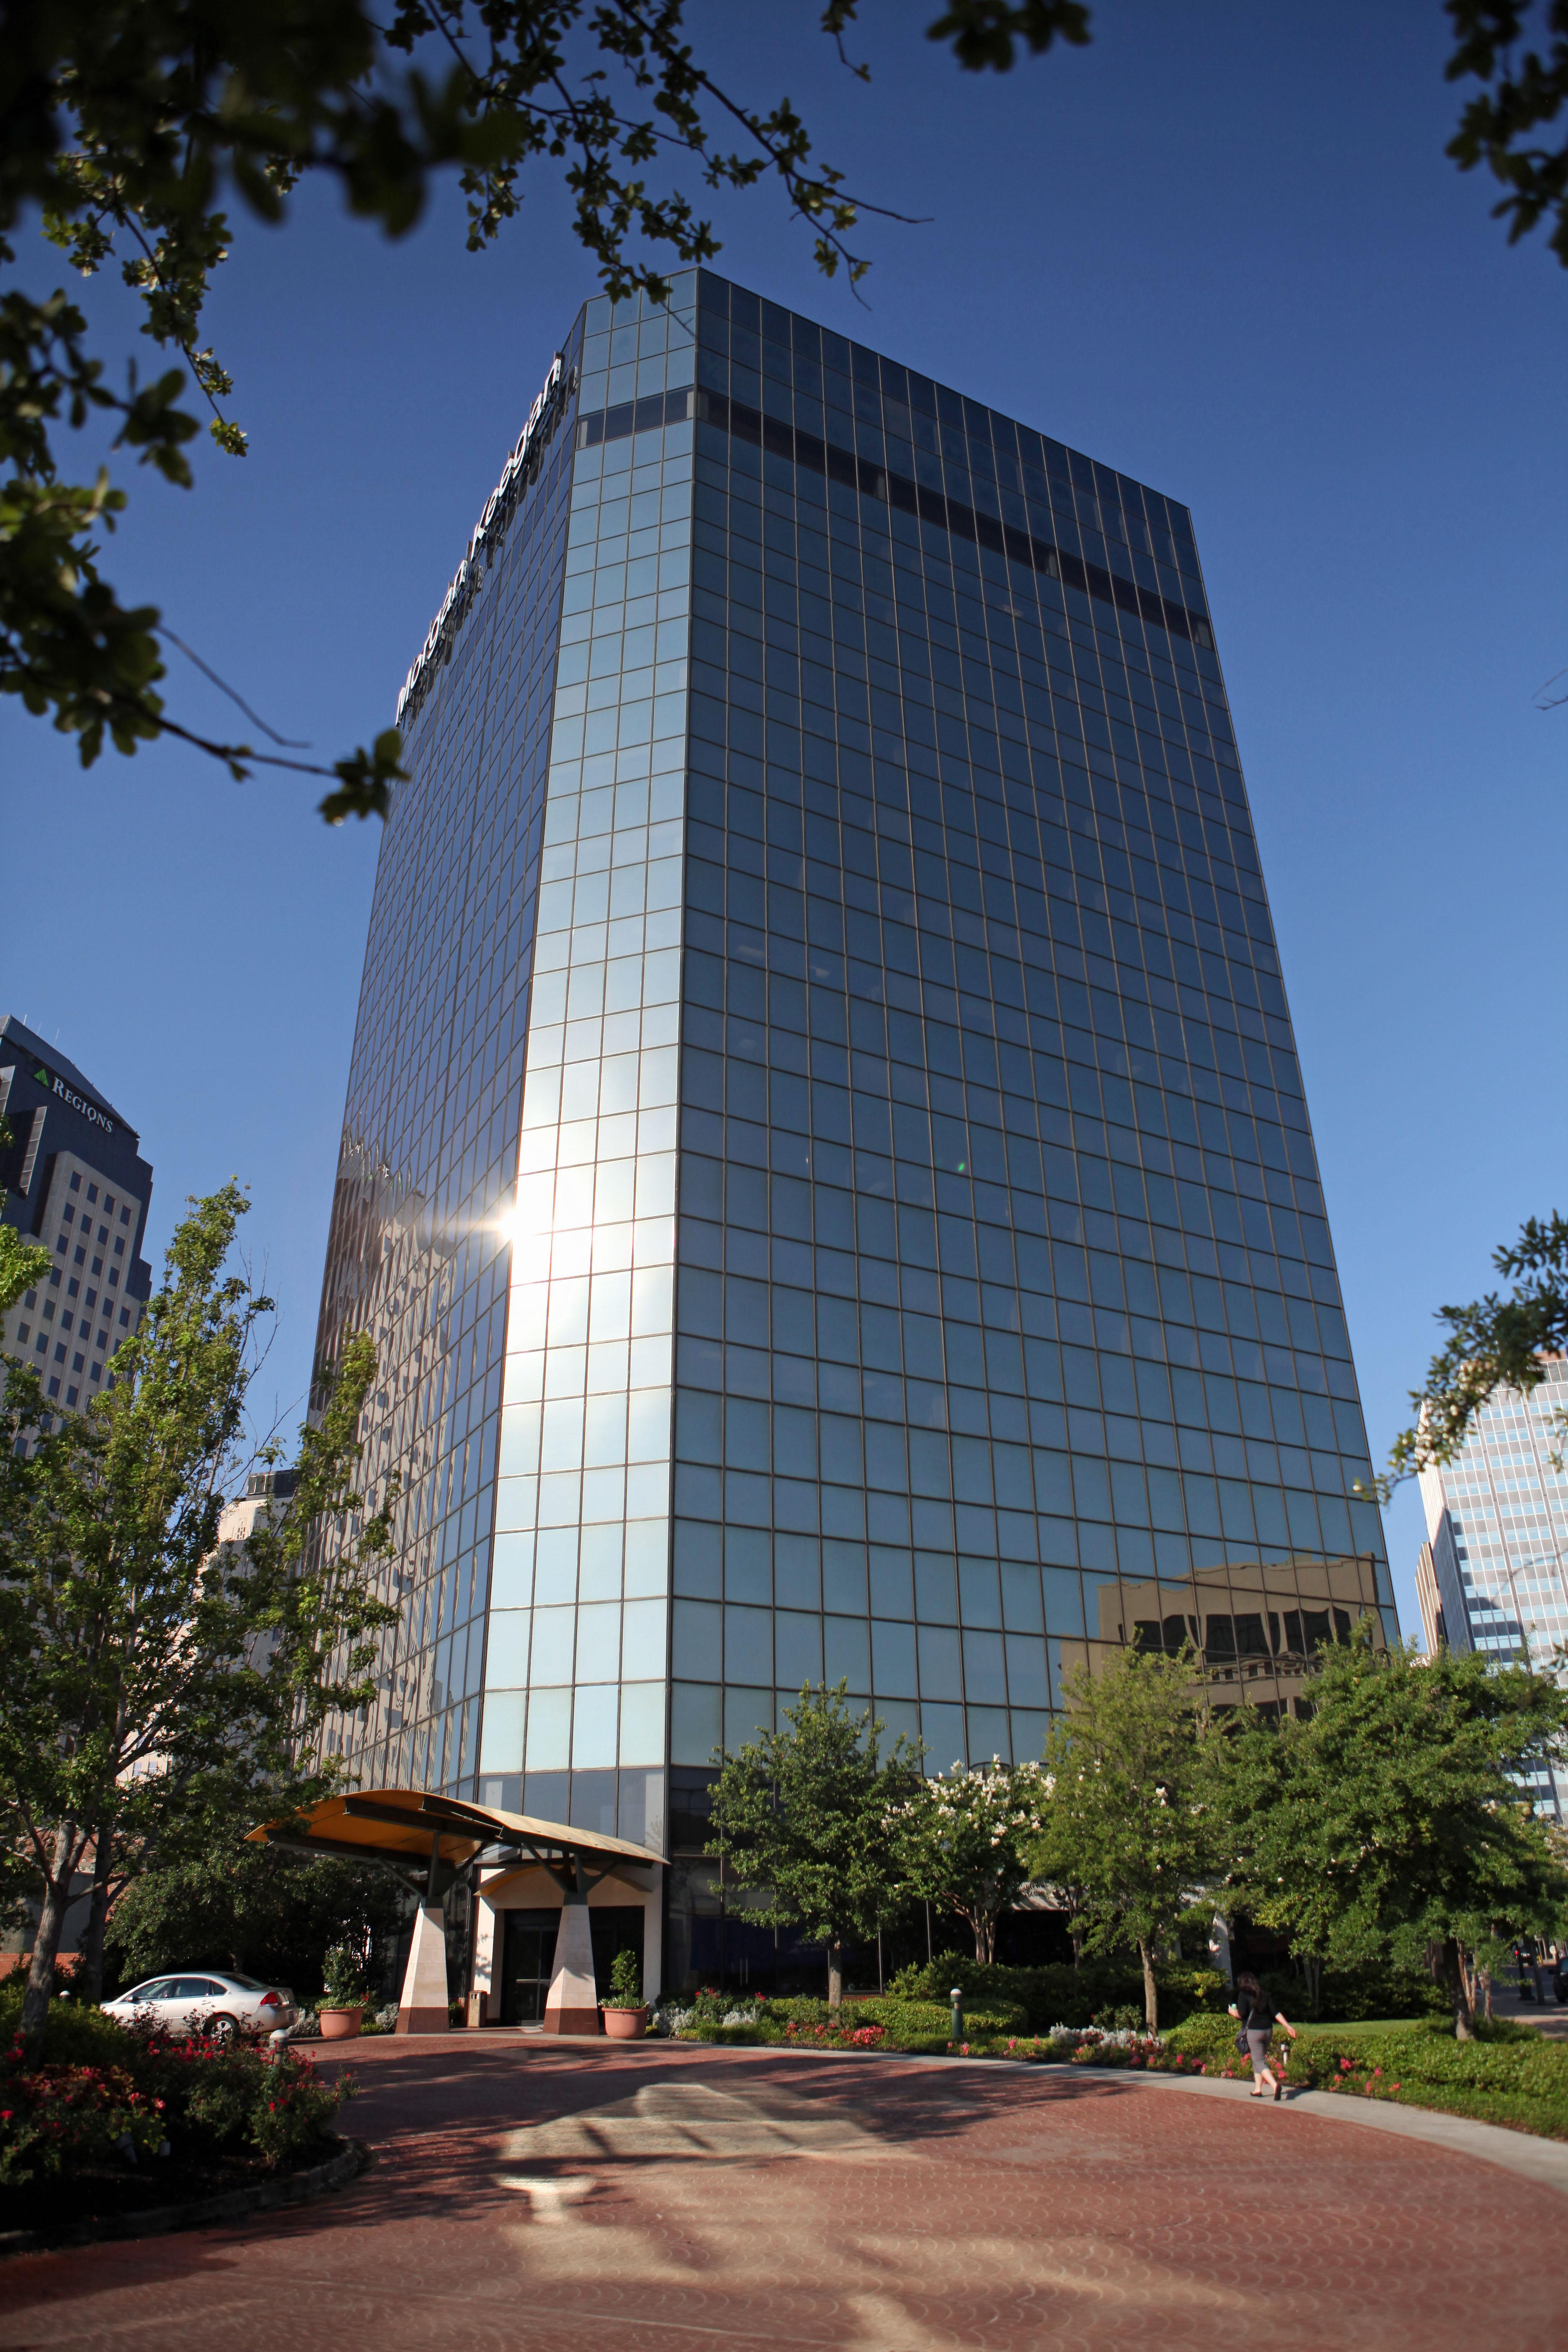 571-Building-Exterior16729